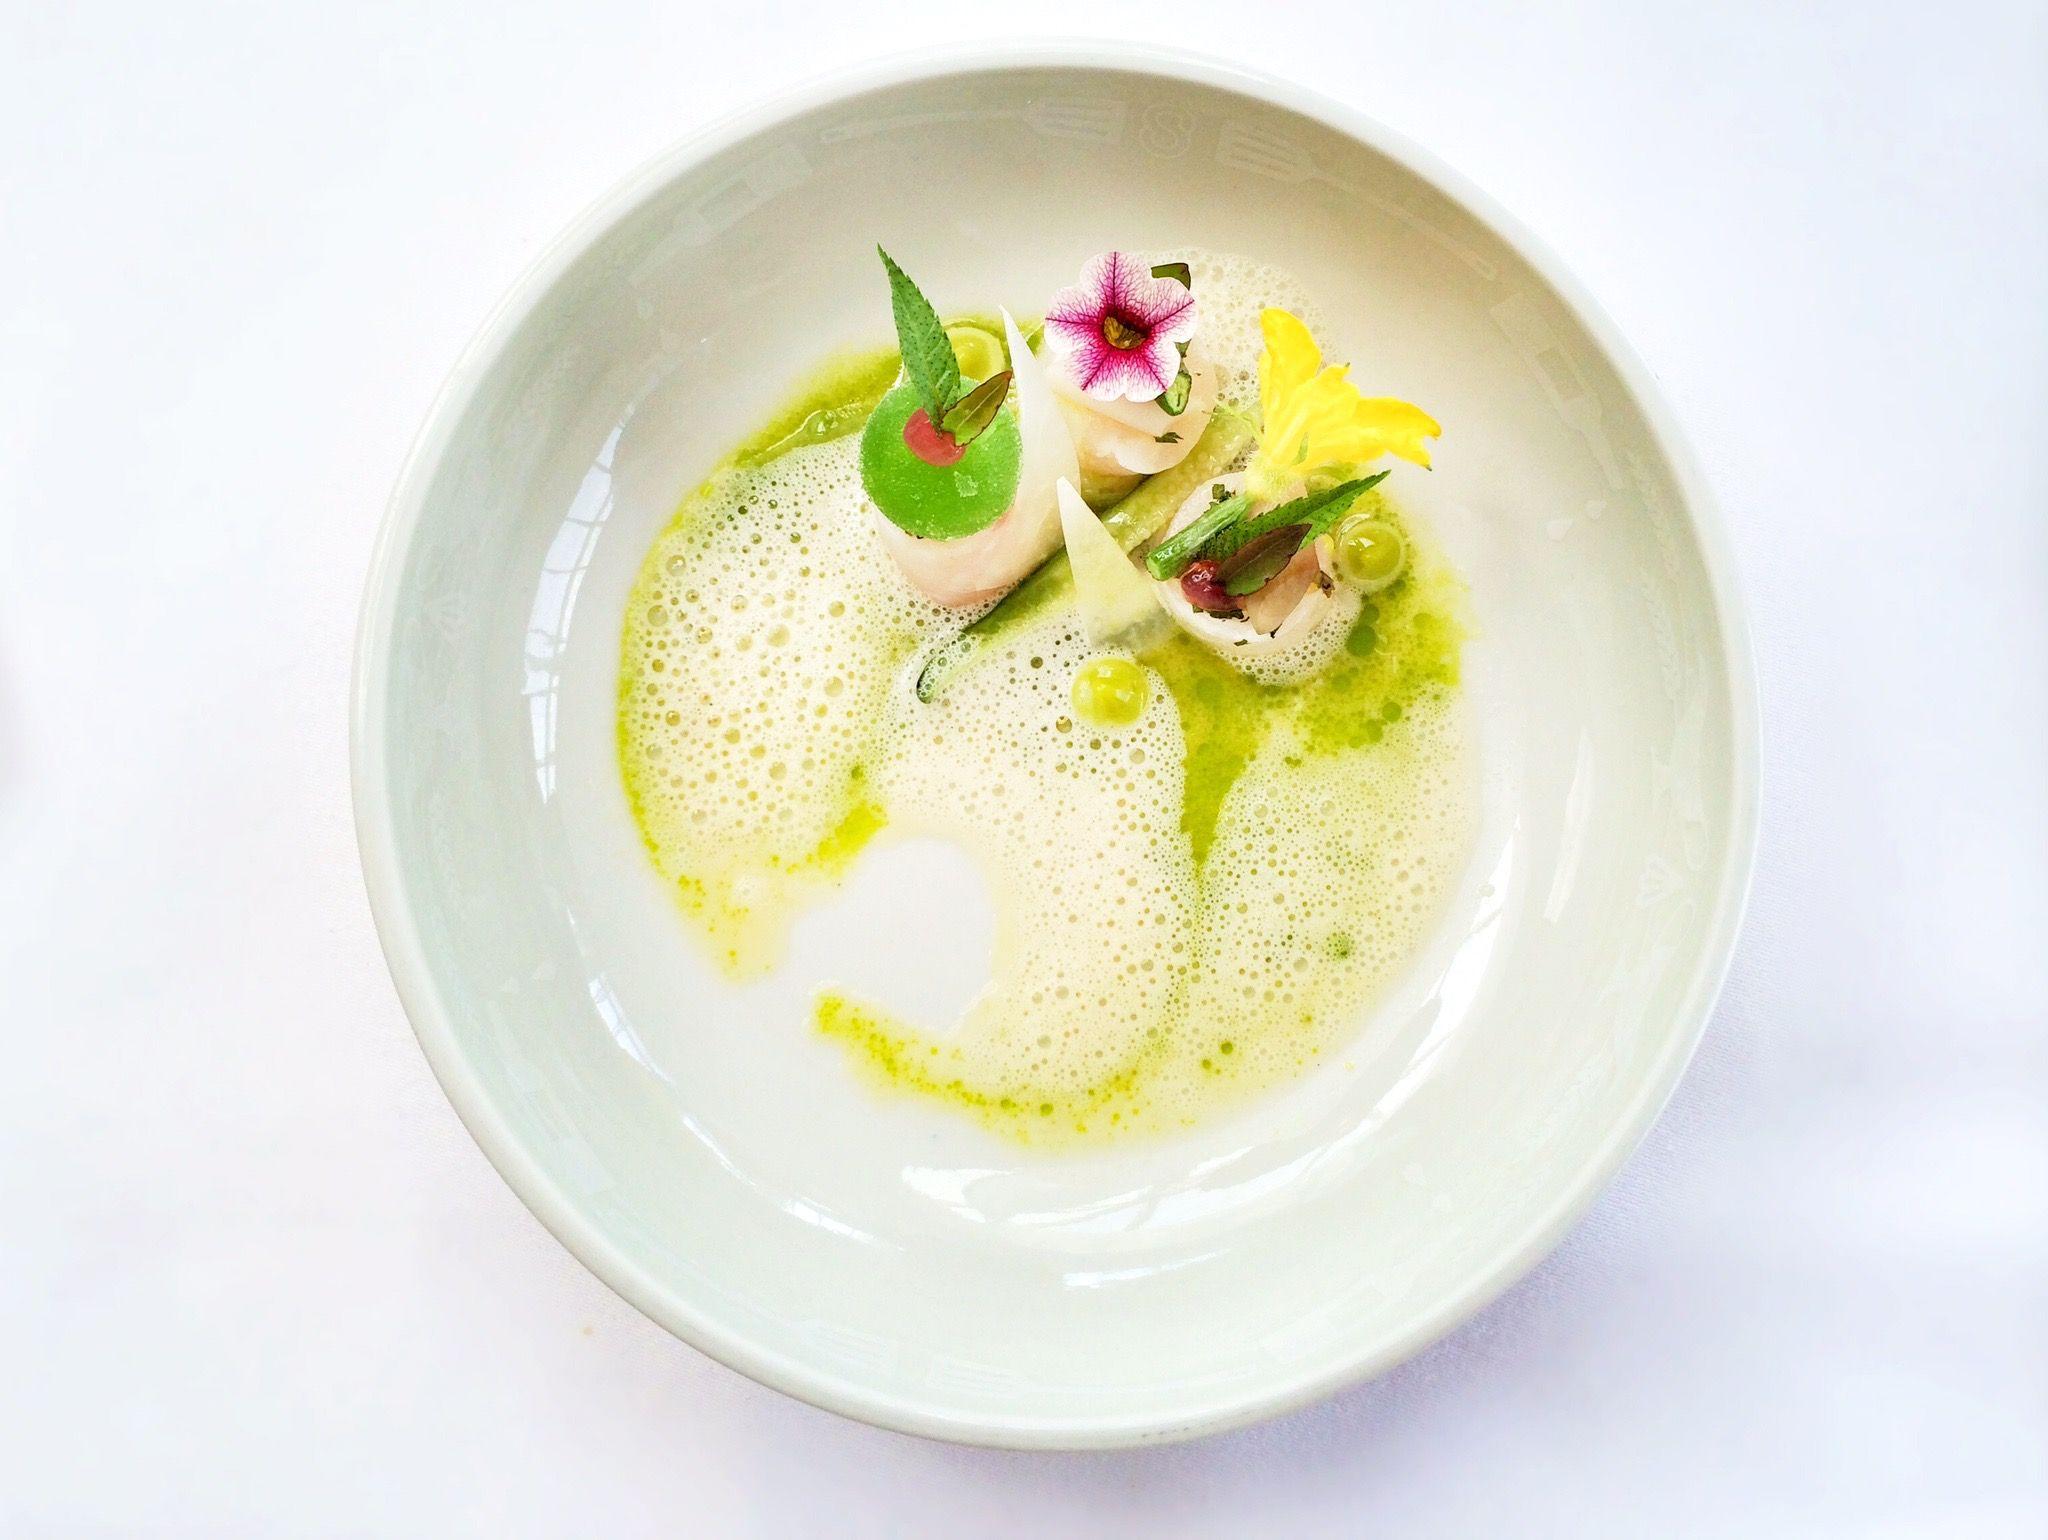 purec-restaurant-cadzand-sergio-herman-gastronomy-fine-dining ...